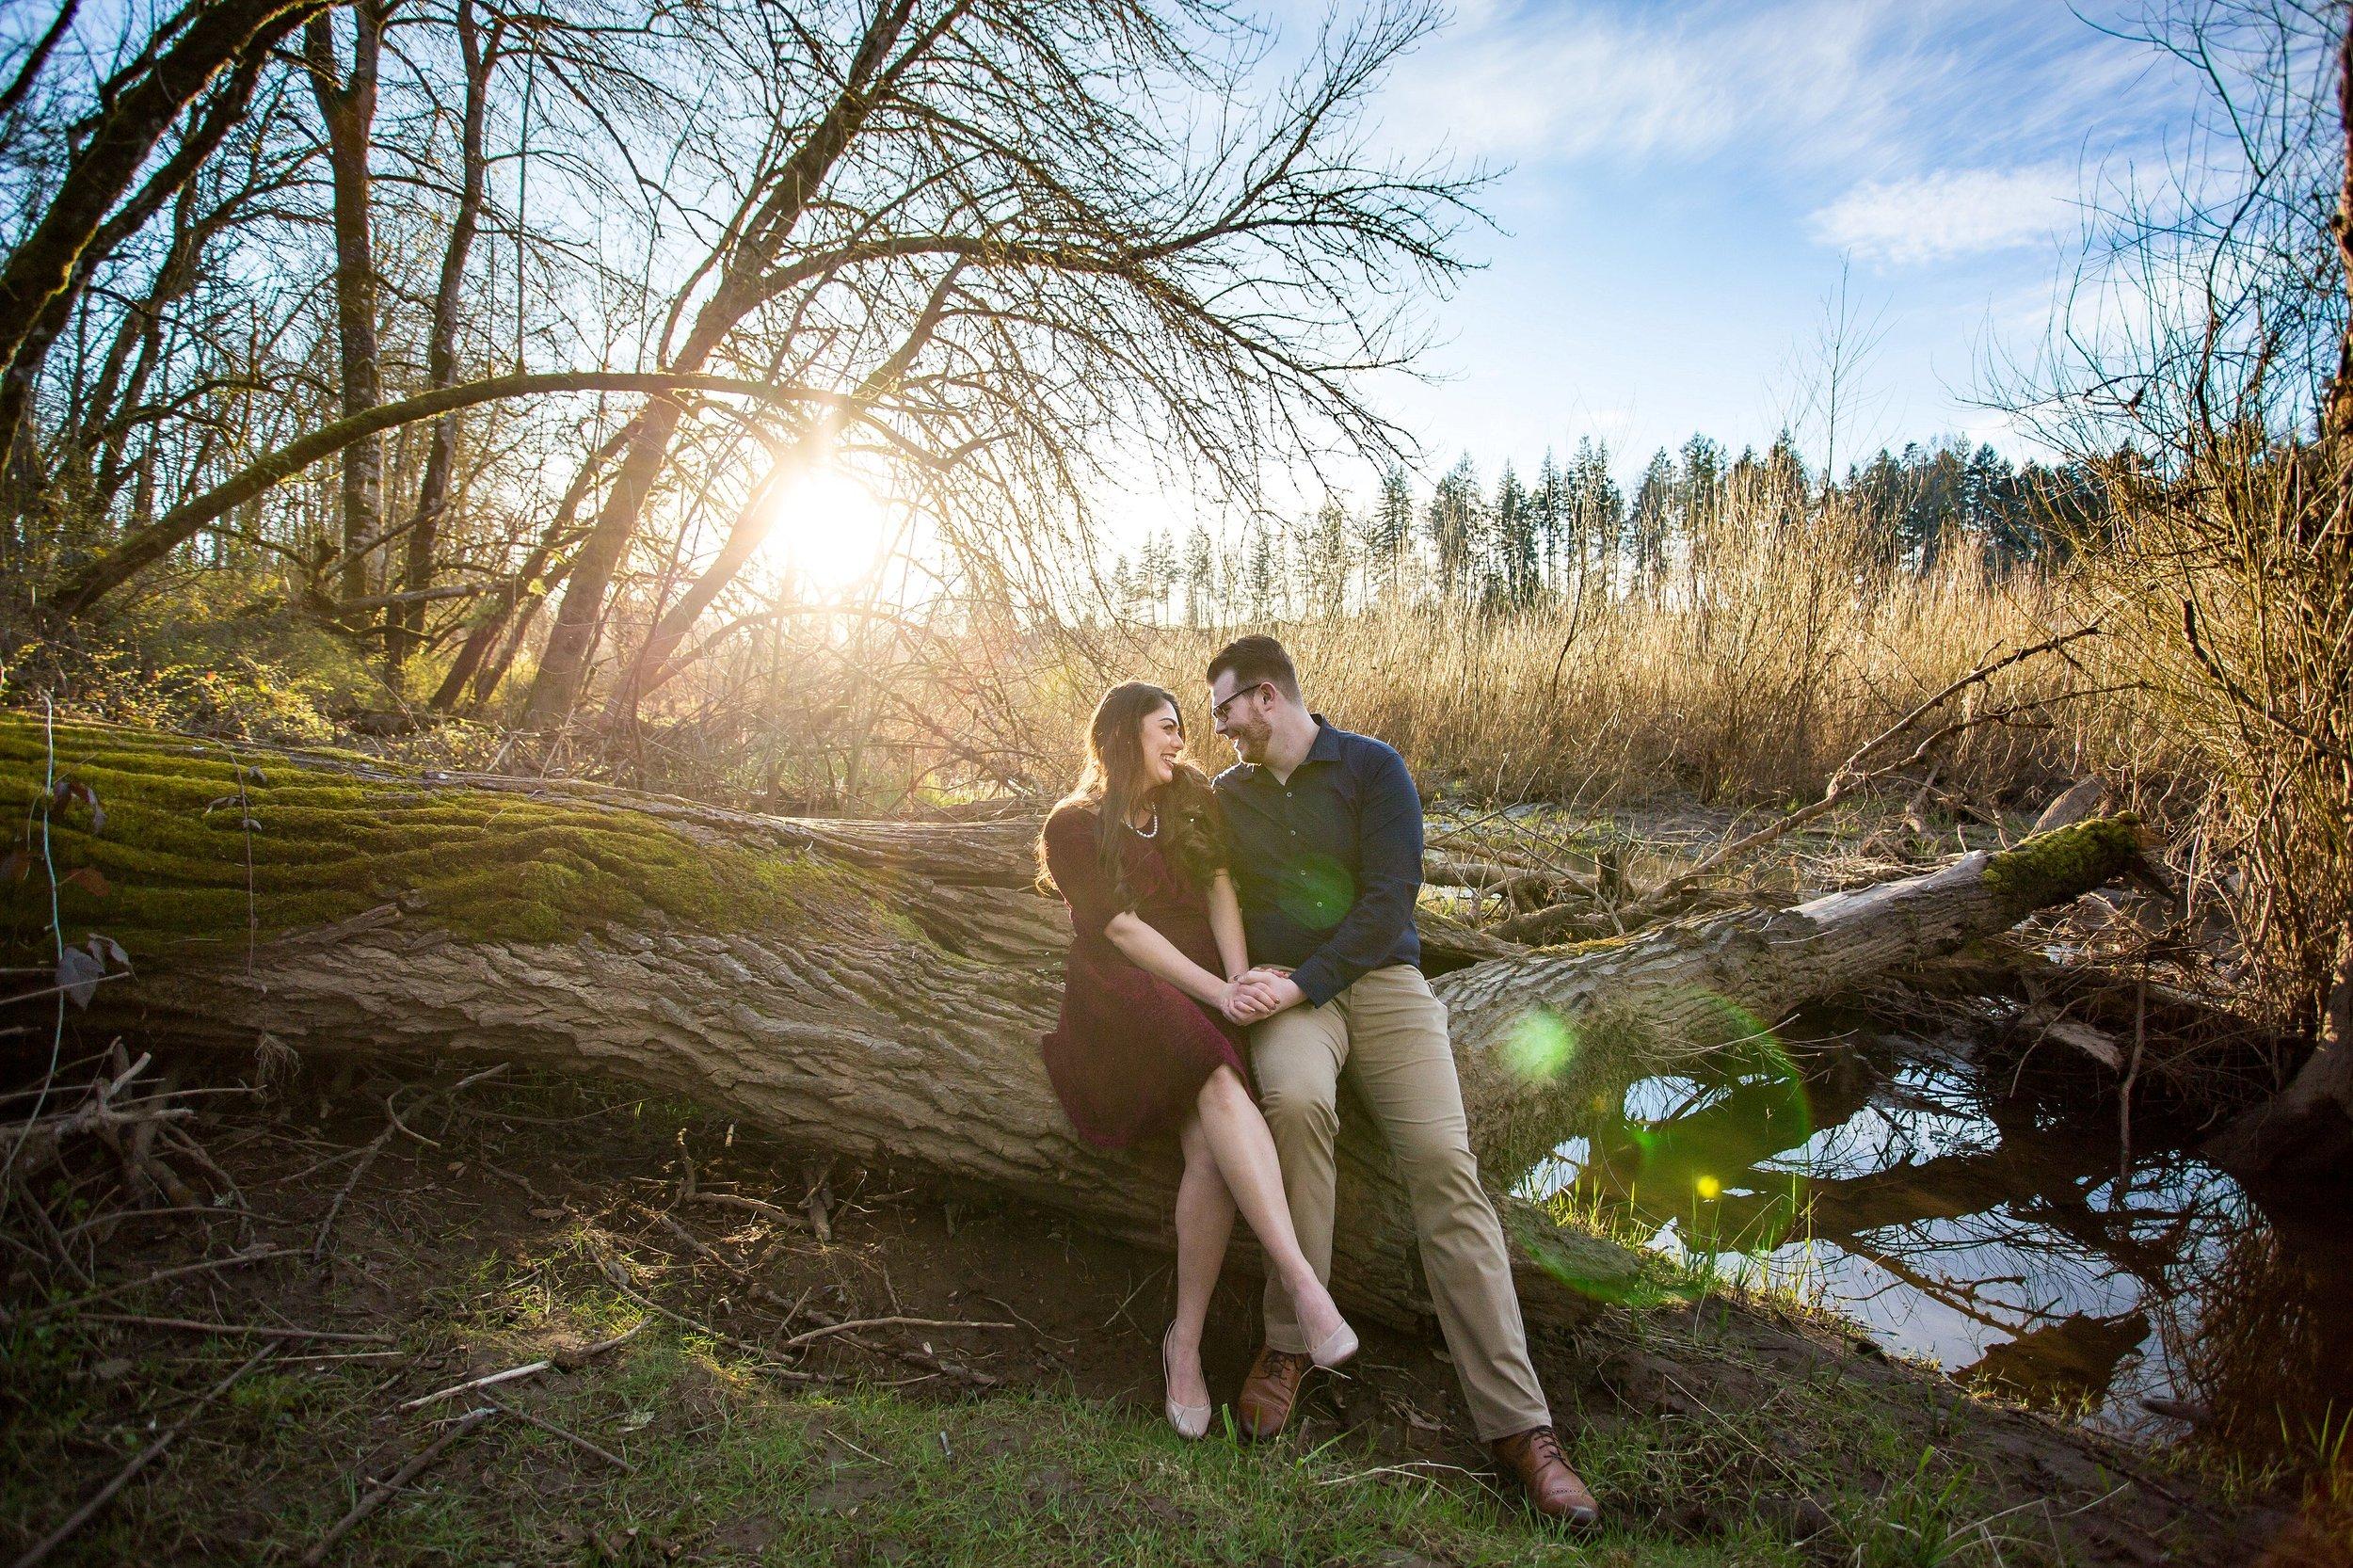 Salem_Oregon_Engagement_Photographer_012.jpg